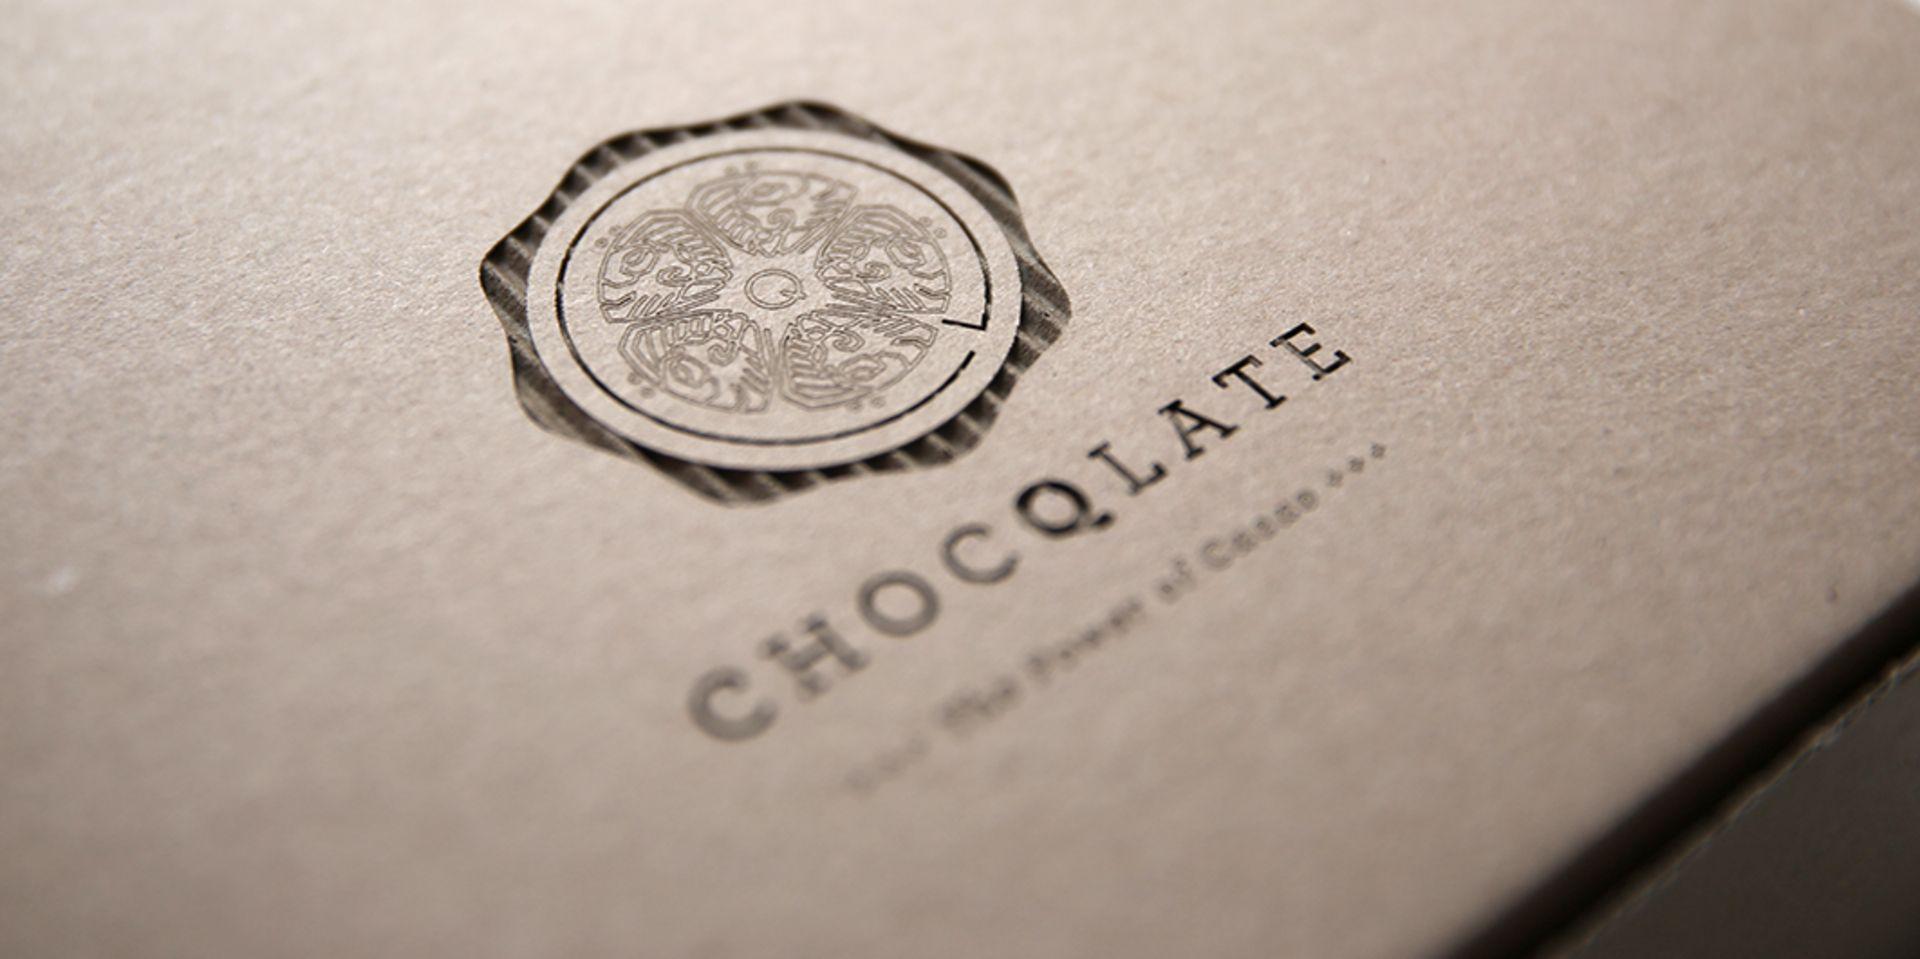 ChocQlate | Corporate Design, packaging design | Beitragsdetails | iF ONLINE EXHIBITION